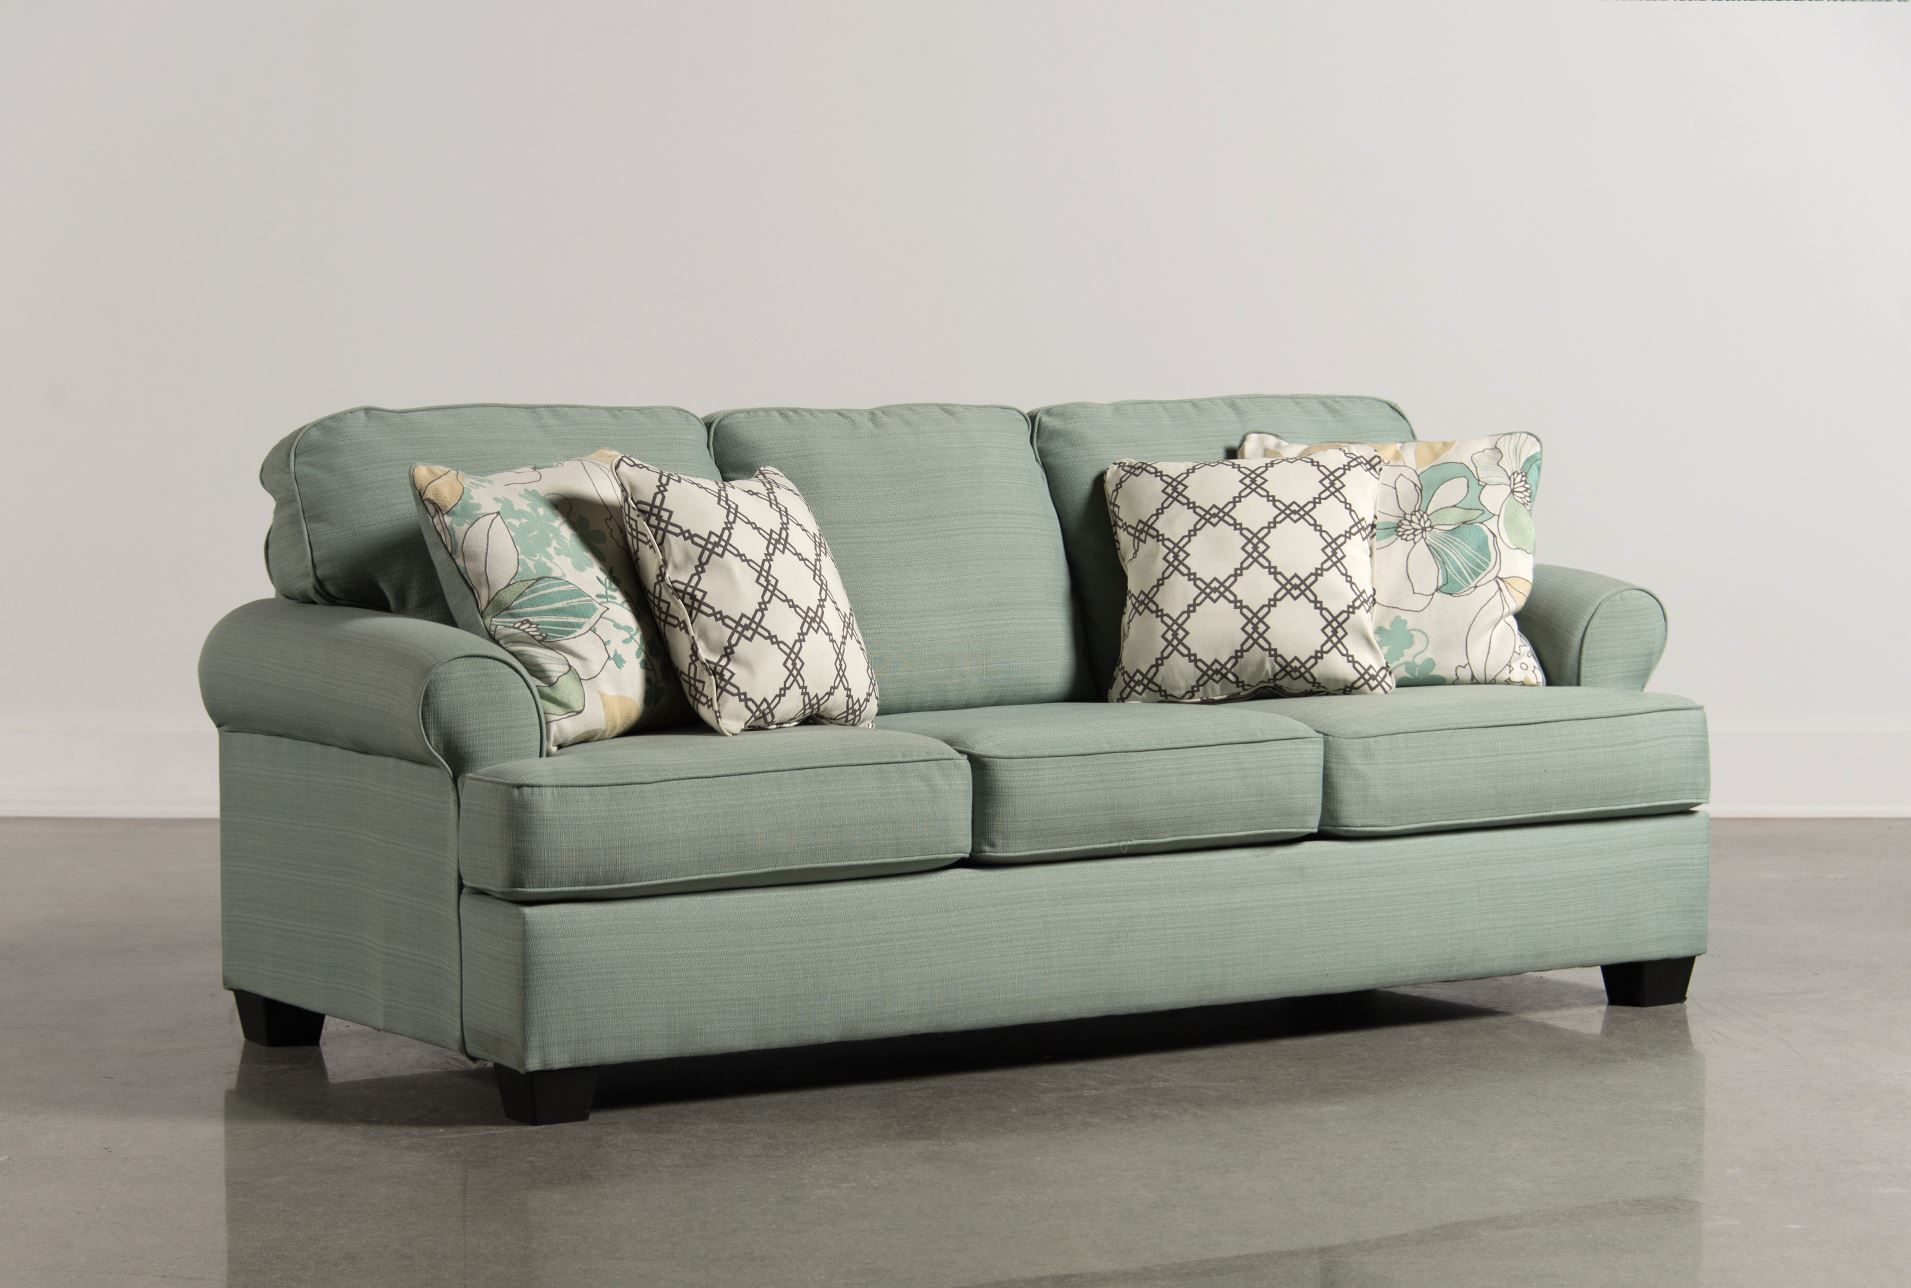 daystar seafoam sofa signature living room pinterest sofa rh pinterest com